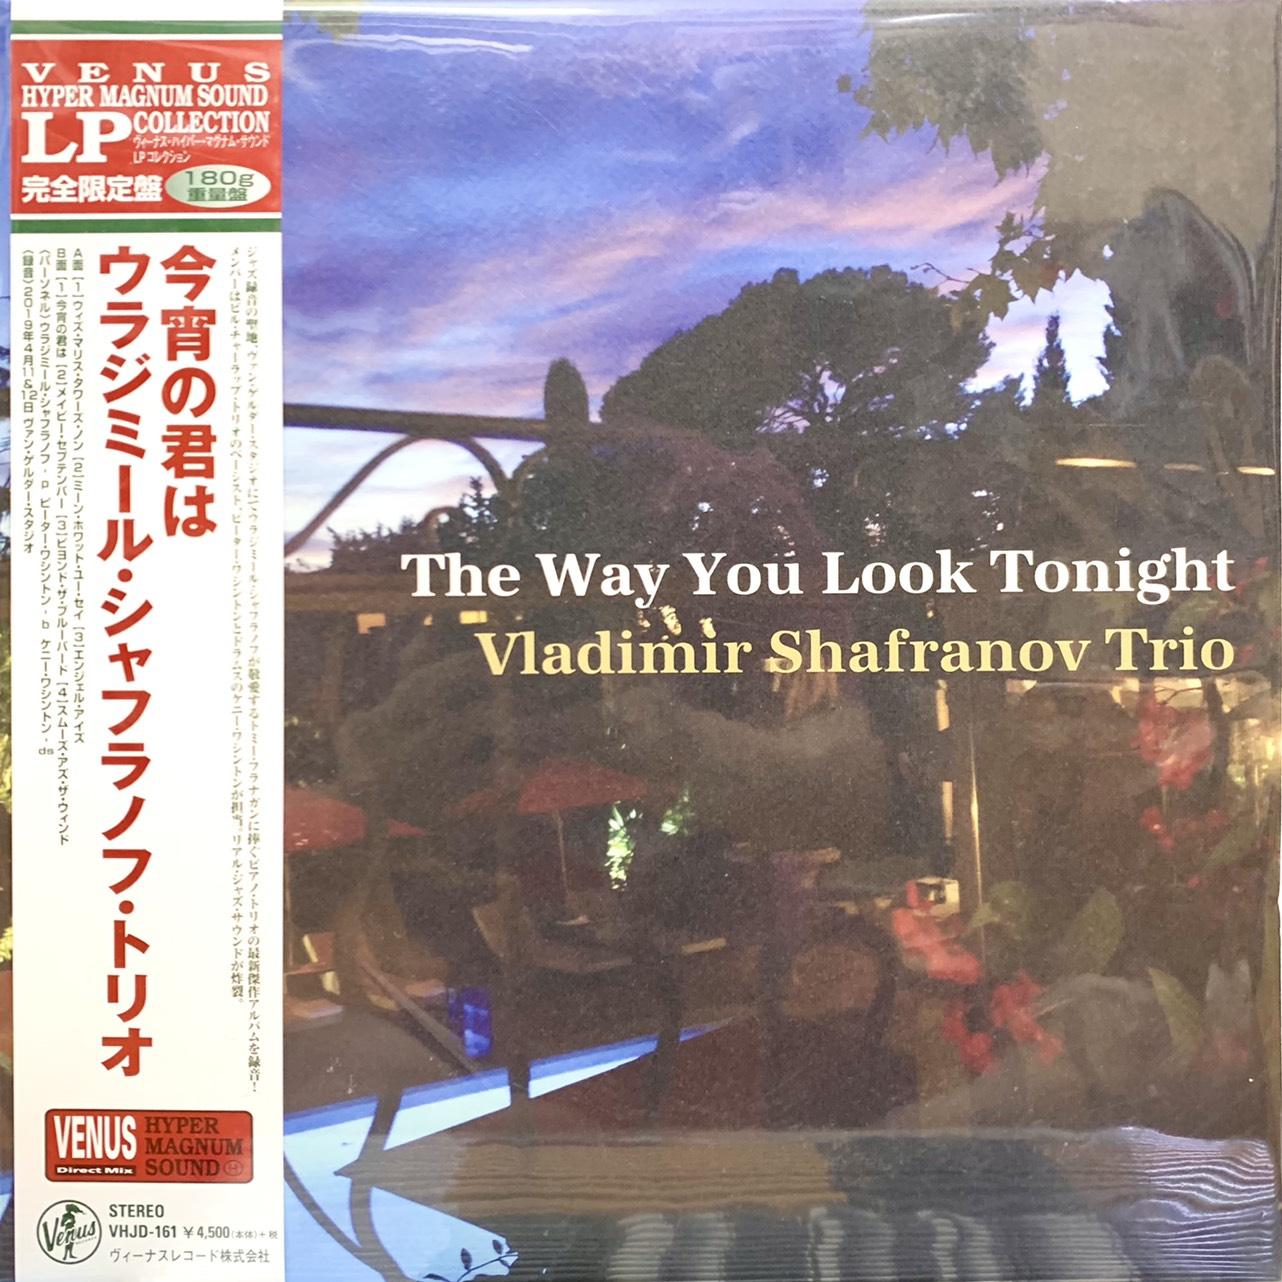 dia-than-vinyl-the-way-you-look-tonight-vladimir-shafranov-trio